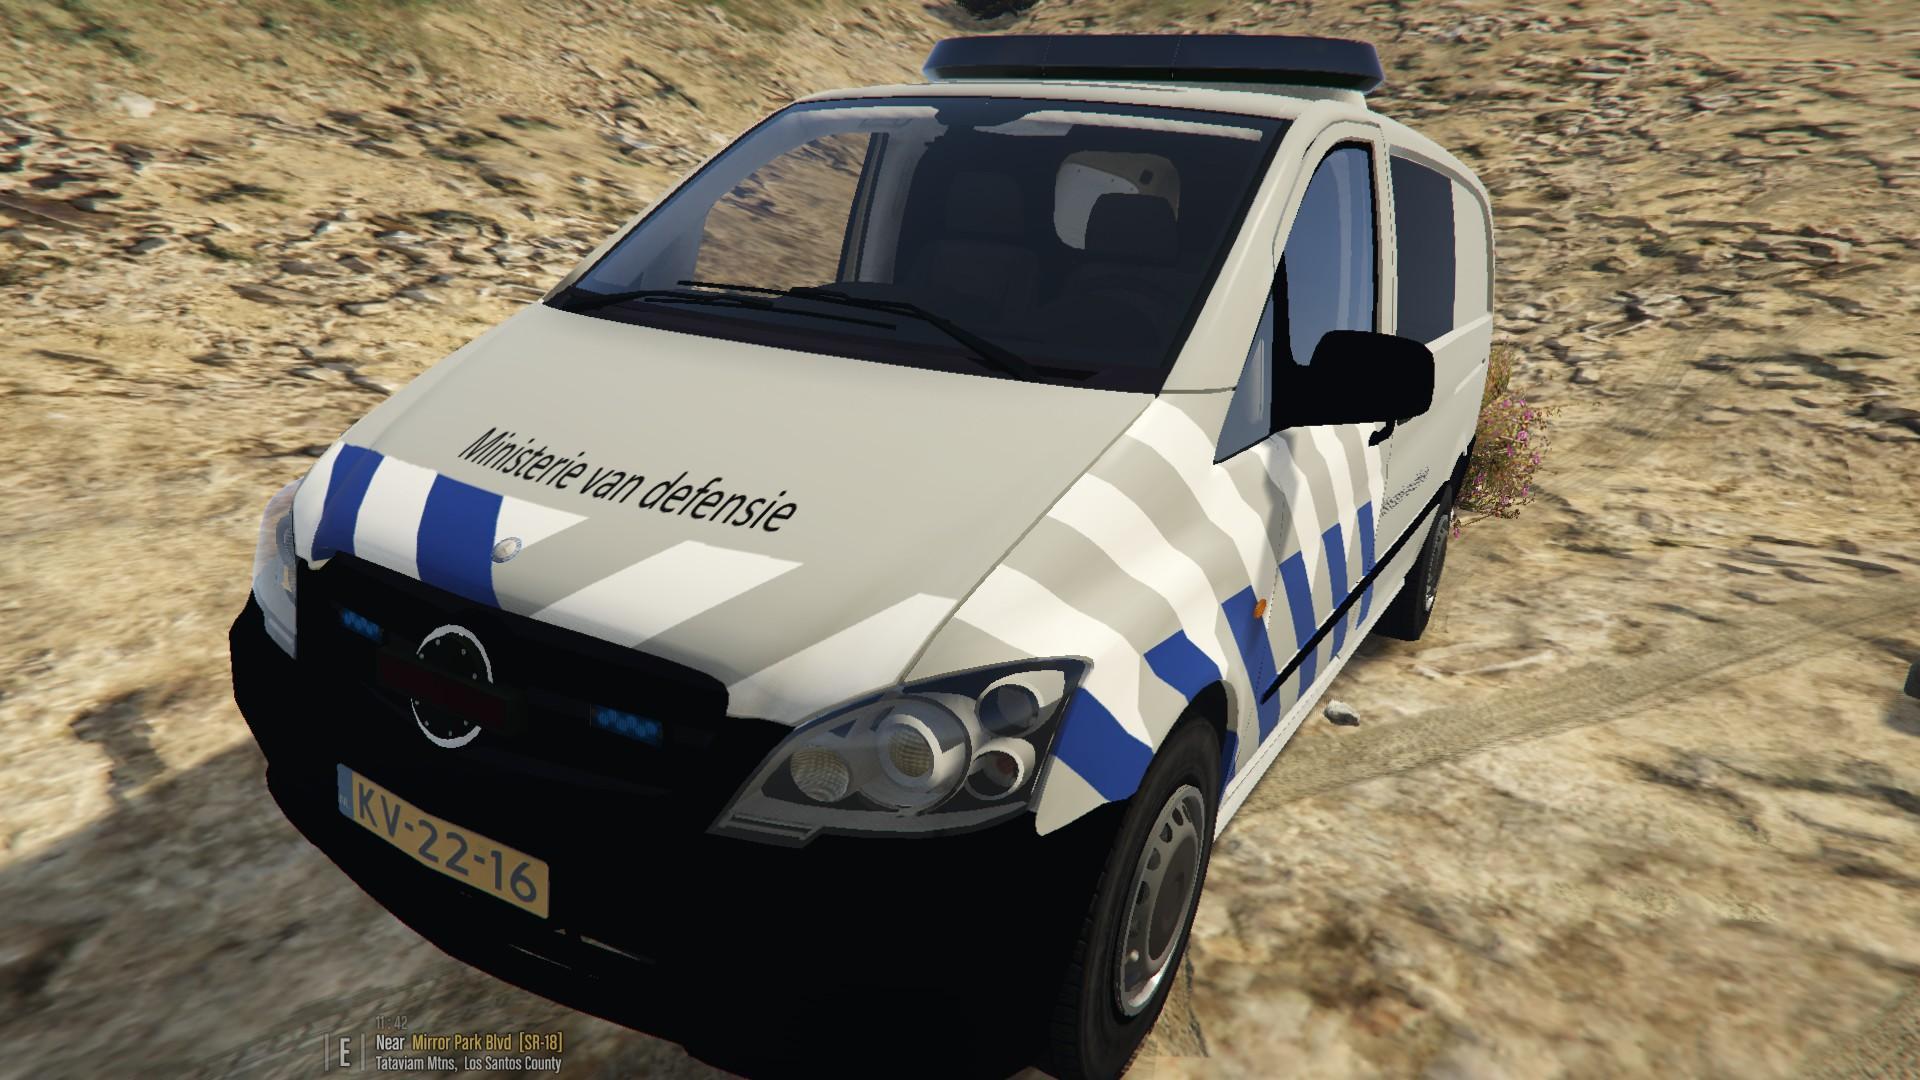 Mercedes Vito Ministerie Van Defensie Gta5 Mods Com